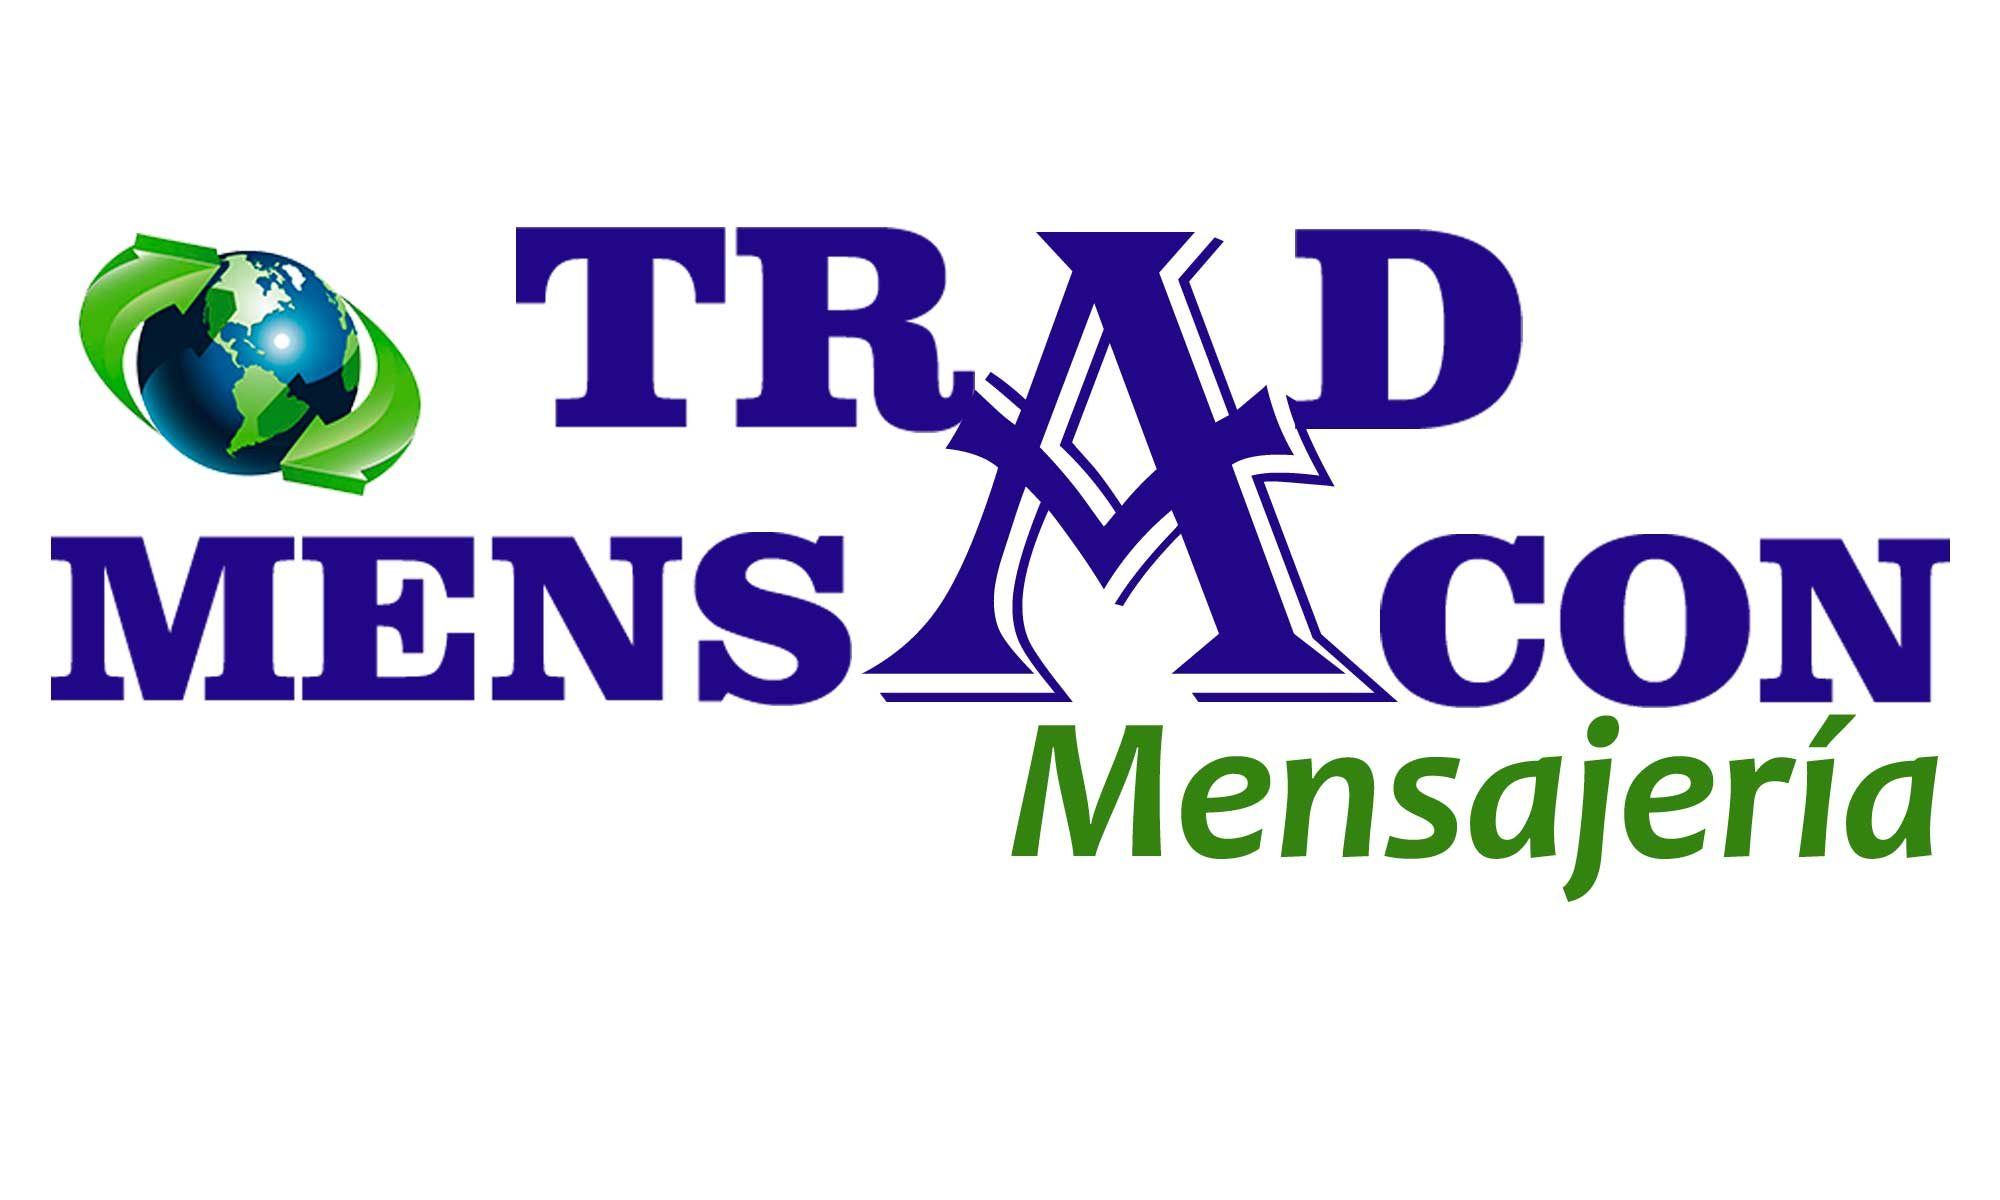 Trad Mansacon S.L.